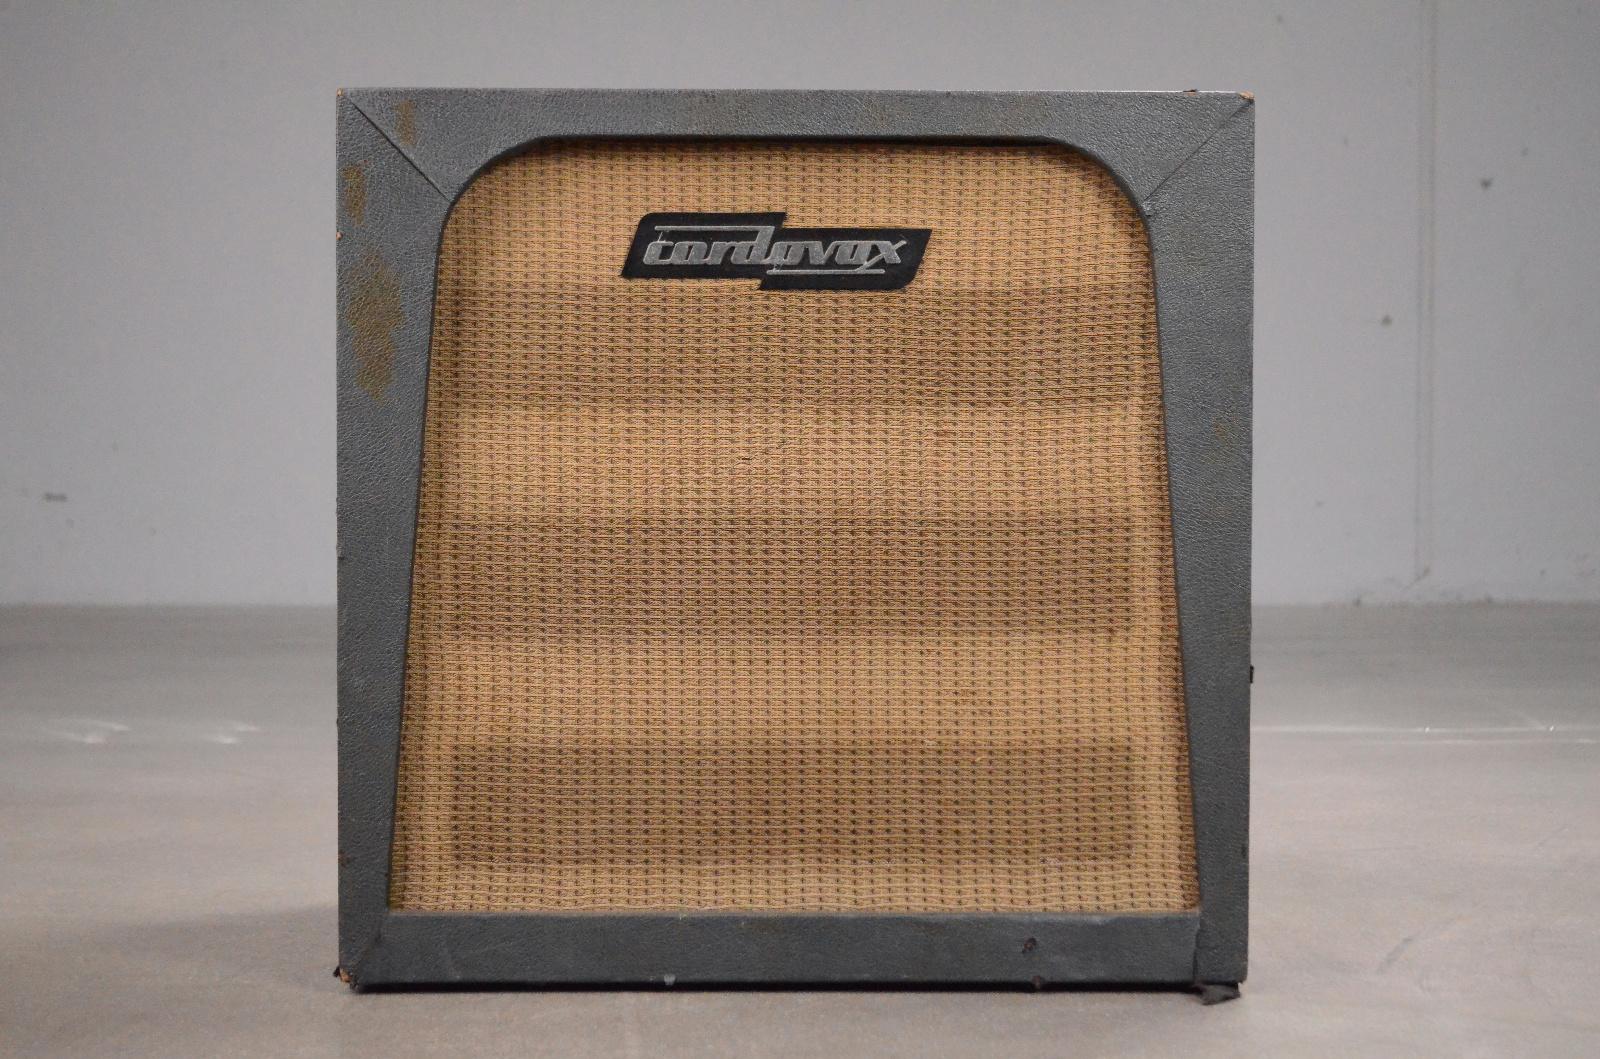 Cordovox 10LR-25 Tremolo Chorus Leslie Rotating Speaker Guitar Cabinet #32232